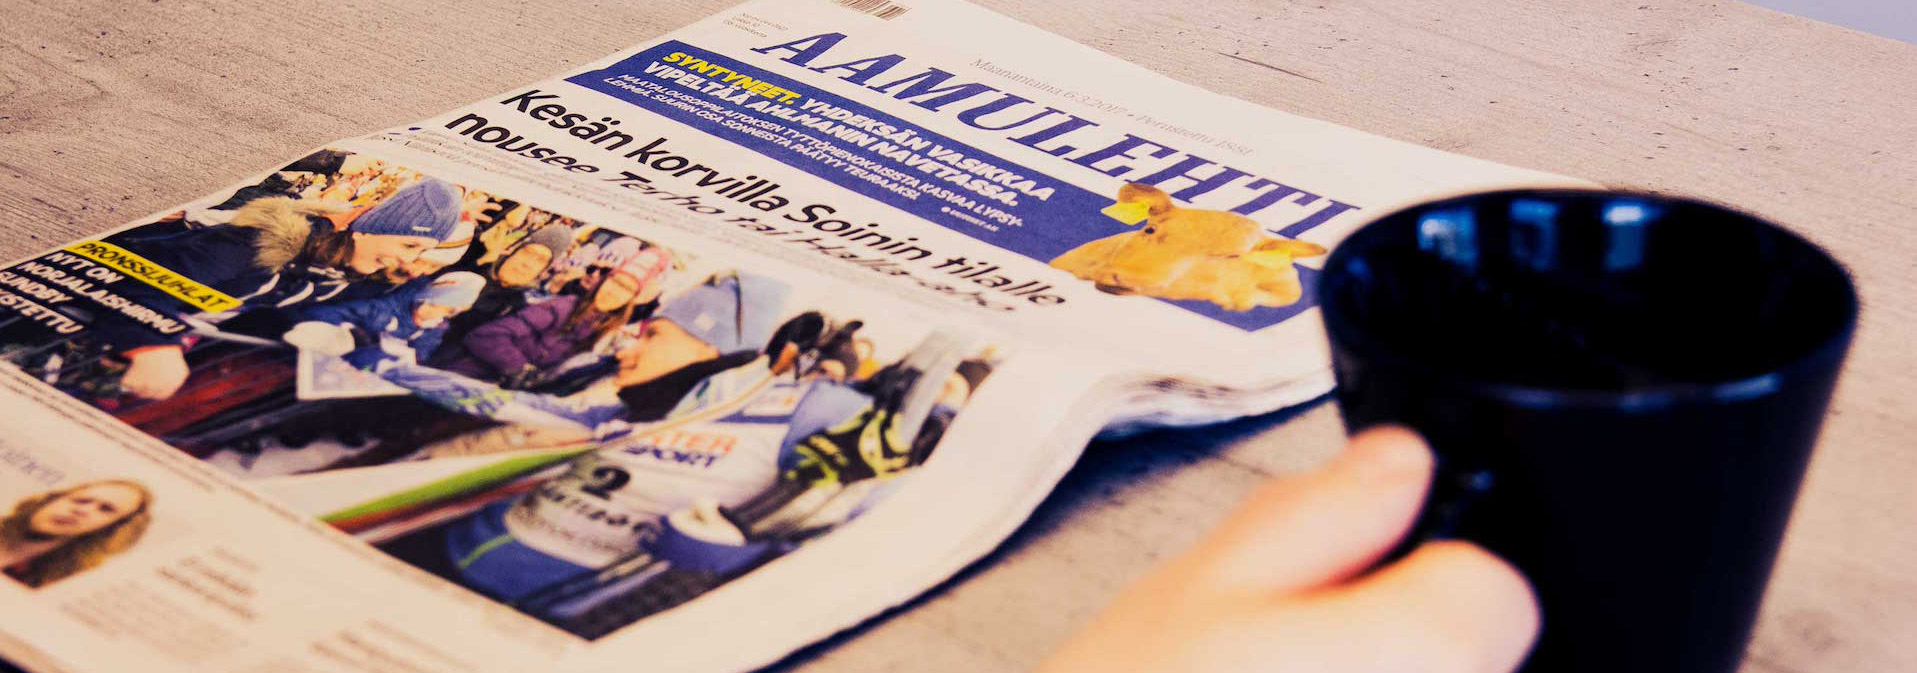 Alma referenssi aamulehti kuva